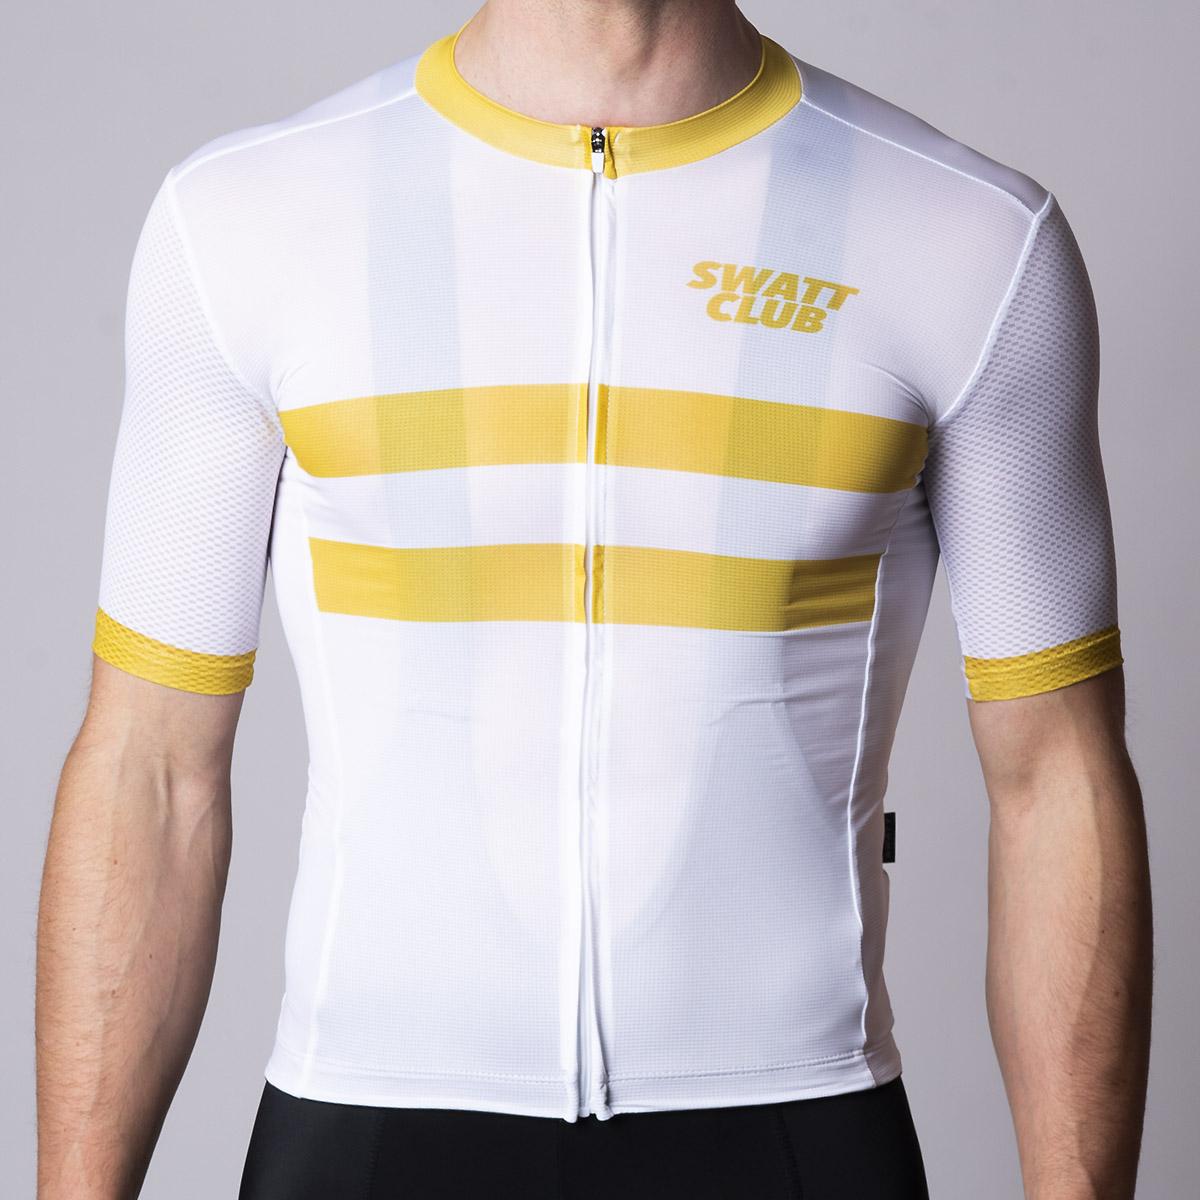 Papale cycling jersey swatt club